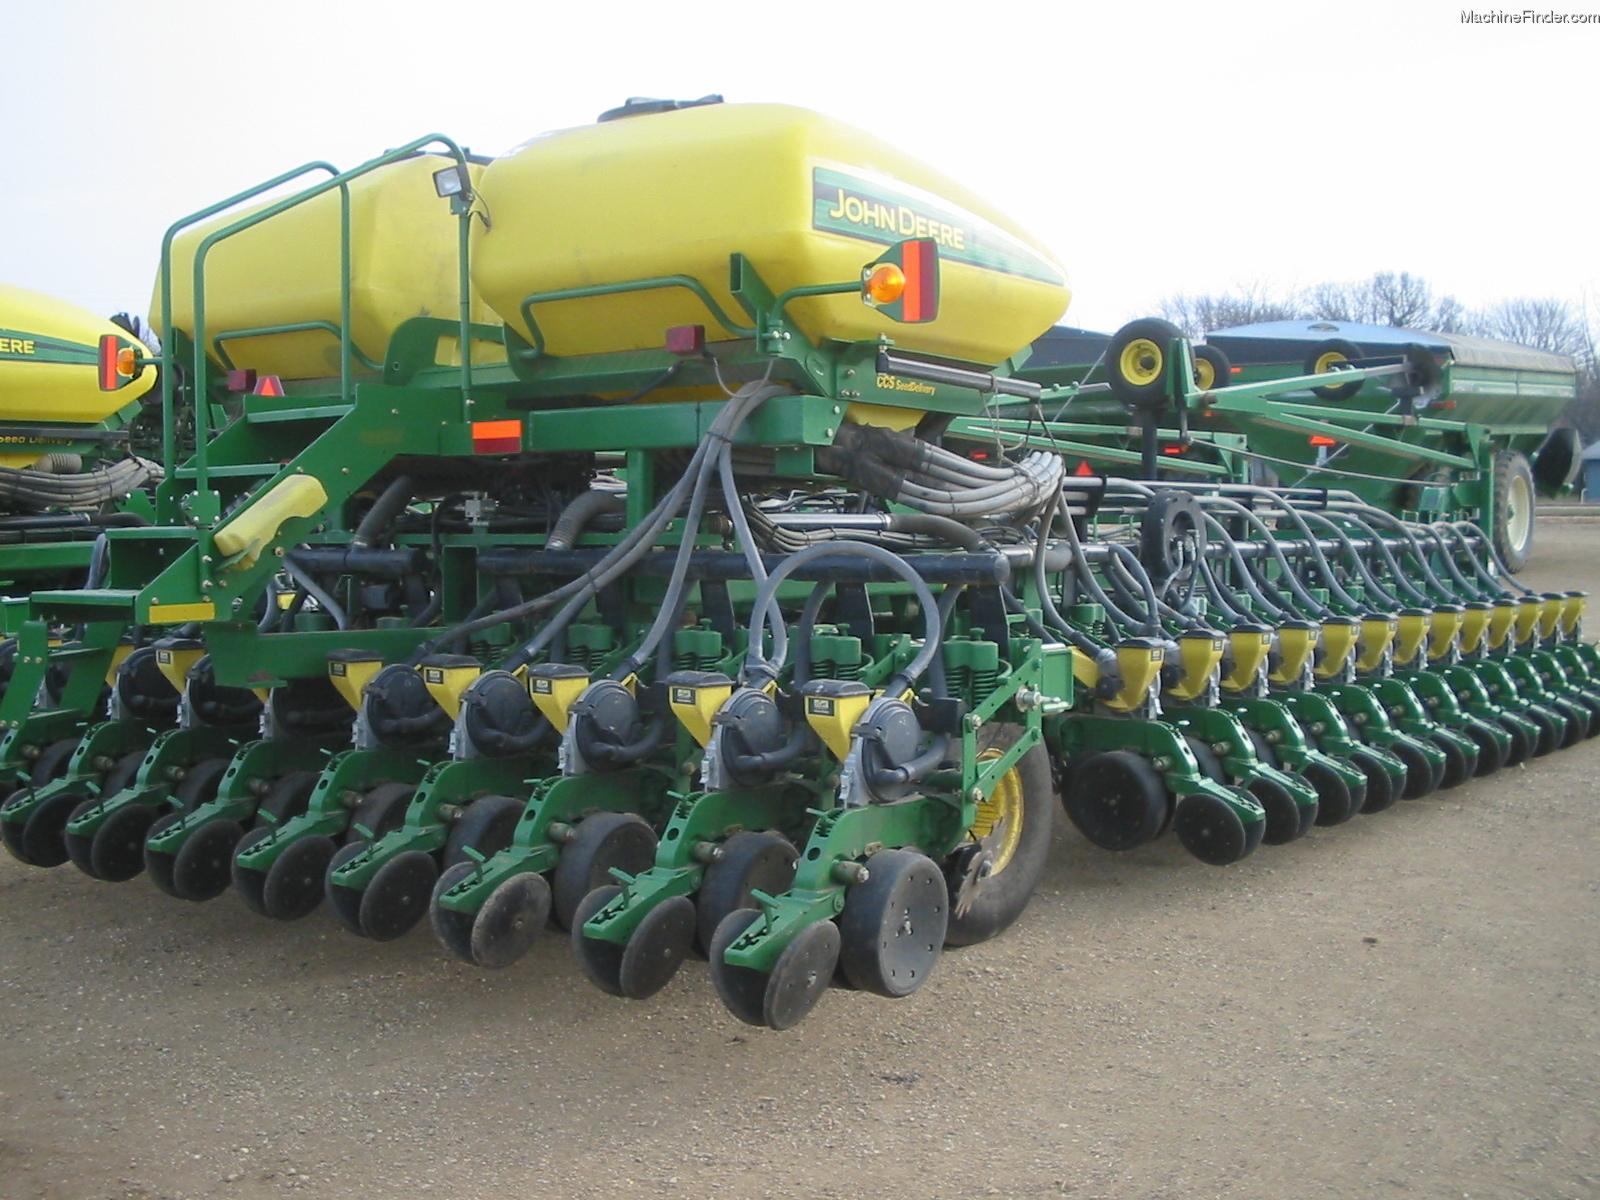 2006 John Deere DB60 Planting & Seeding - Planters - John Deere ...